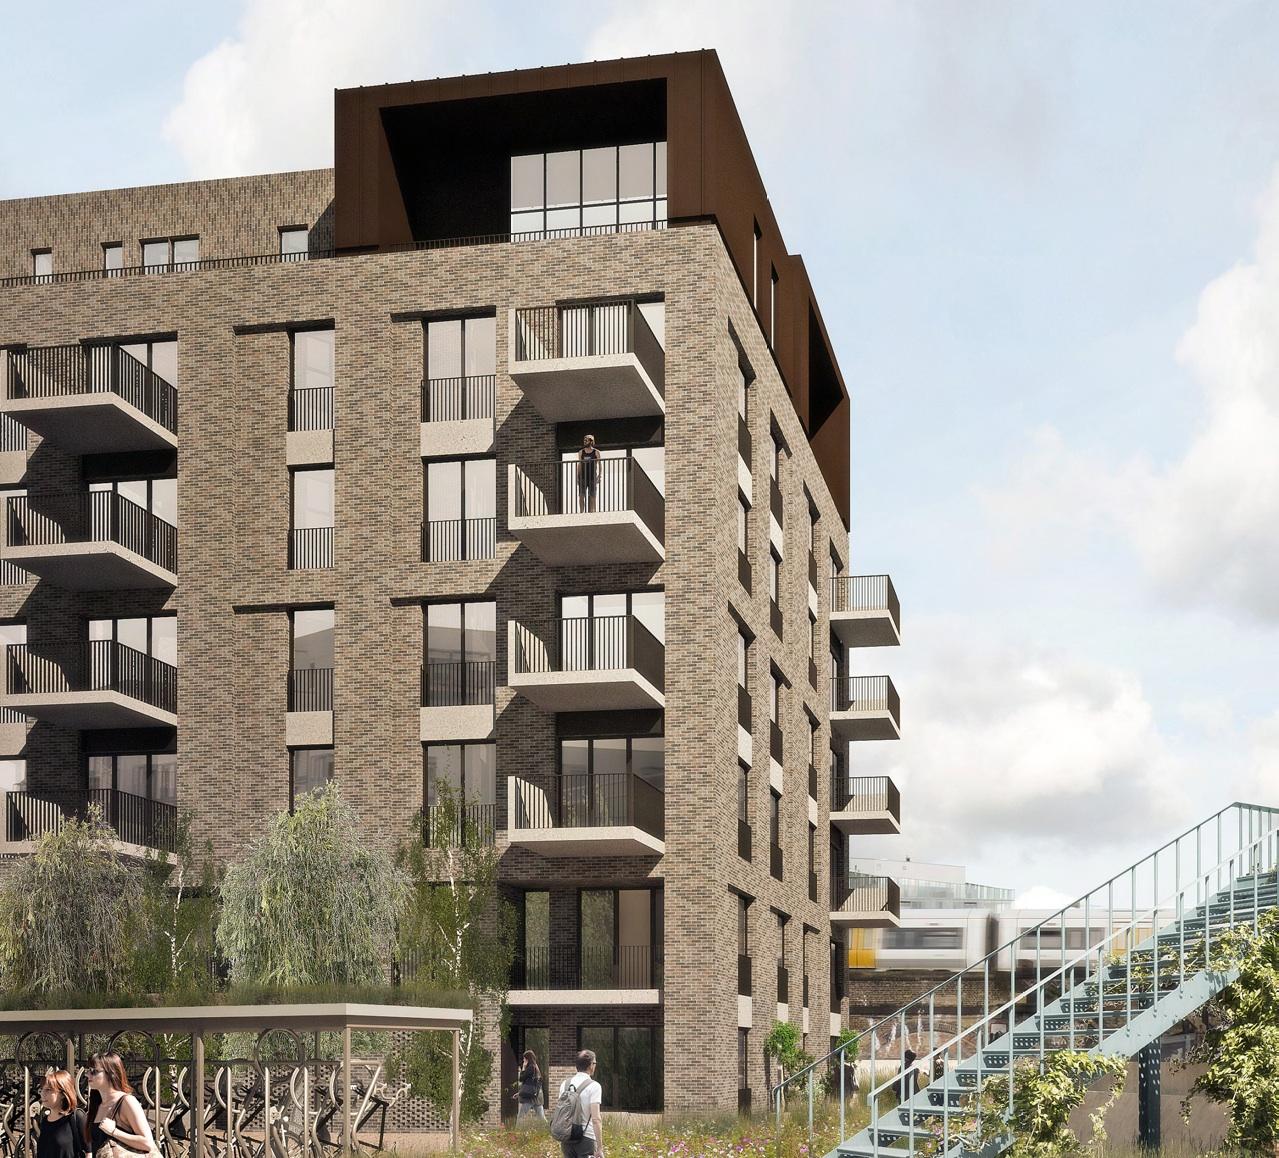 The Deptford Dame: Faircharm Redevelopment Plans Threaten